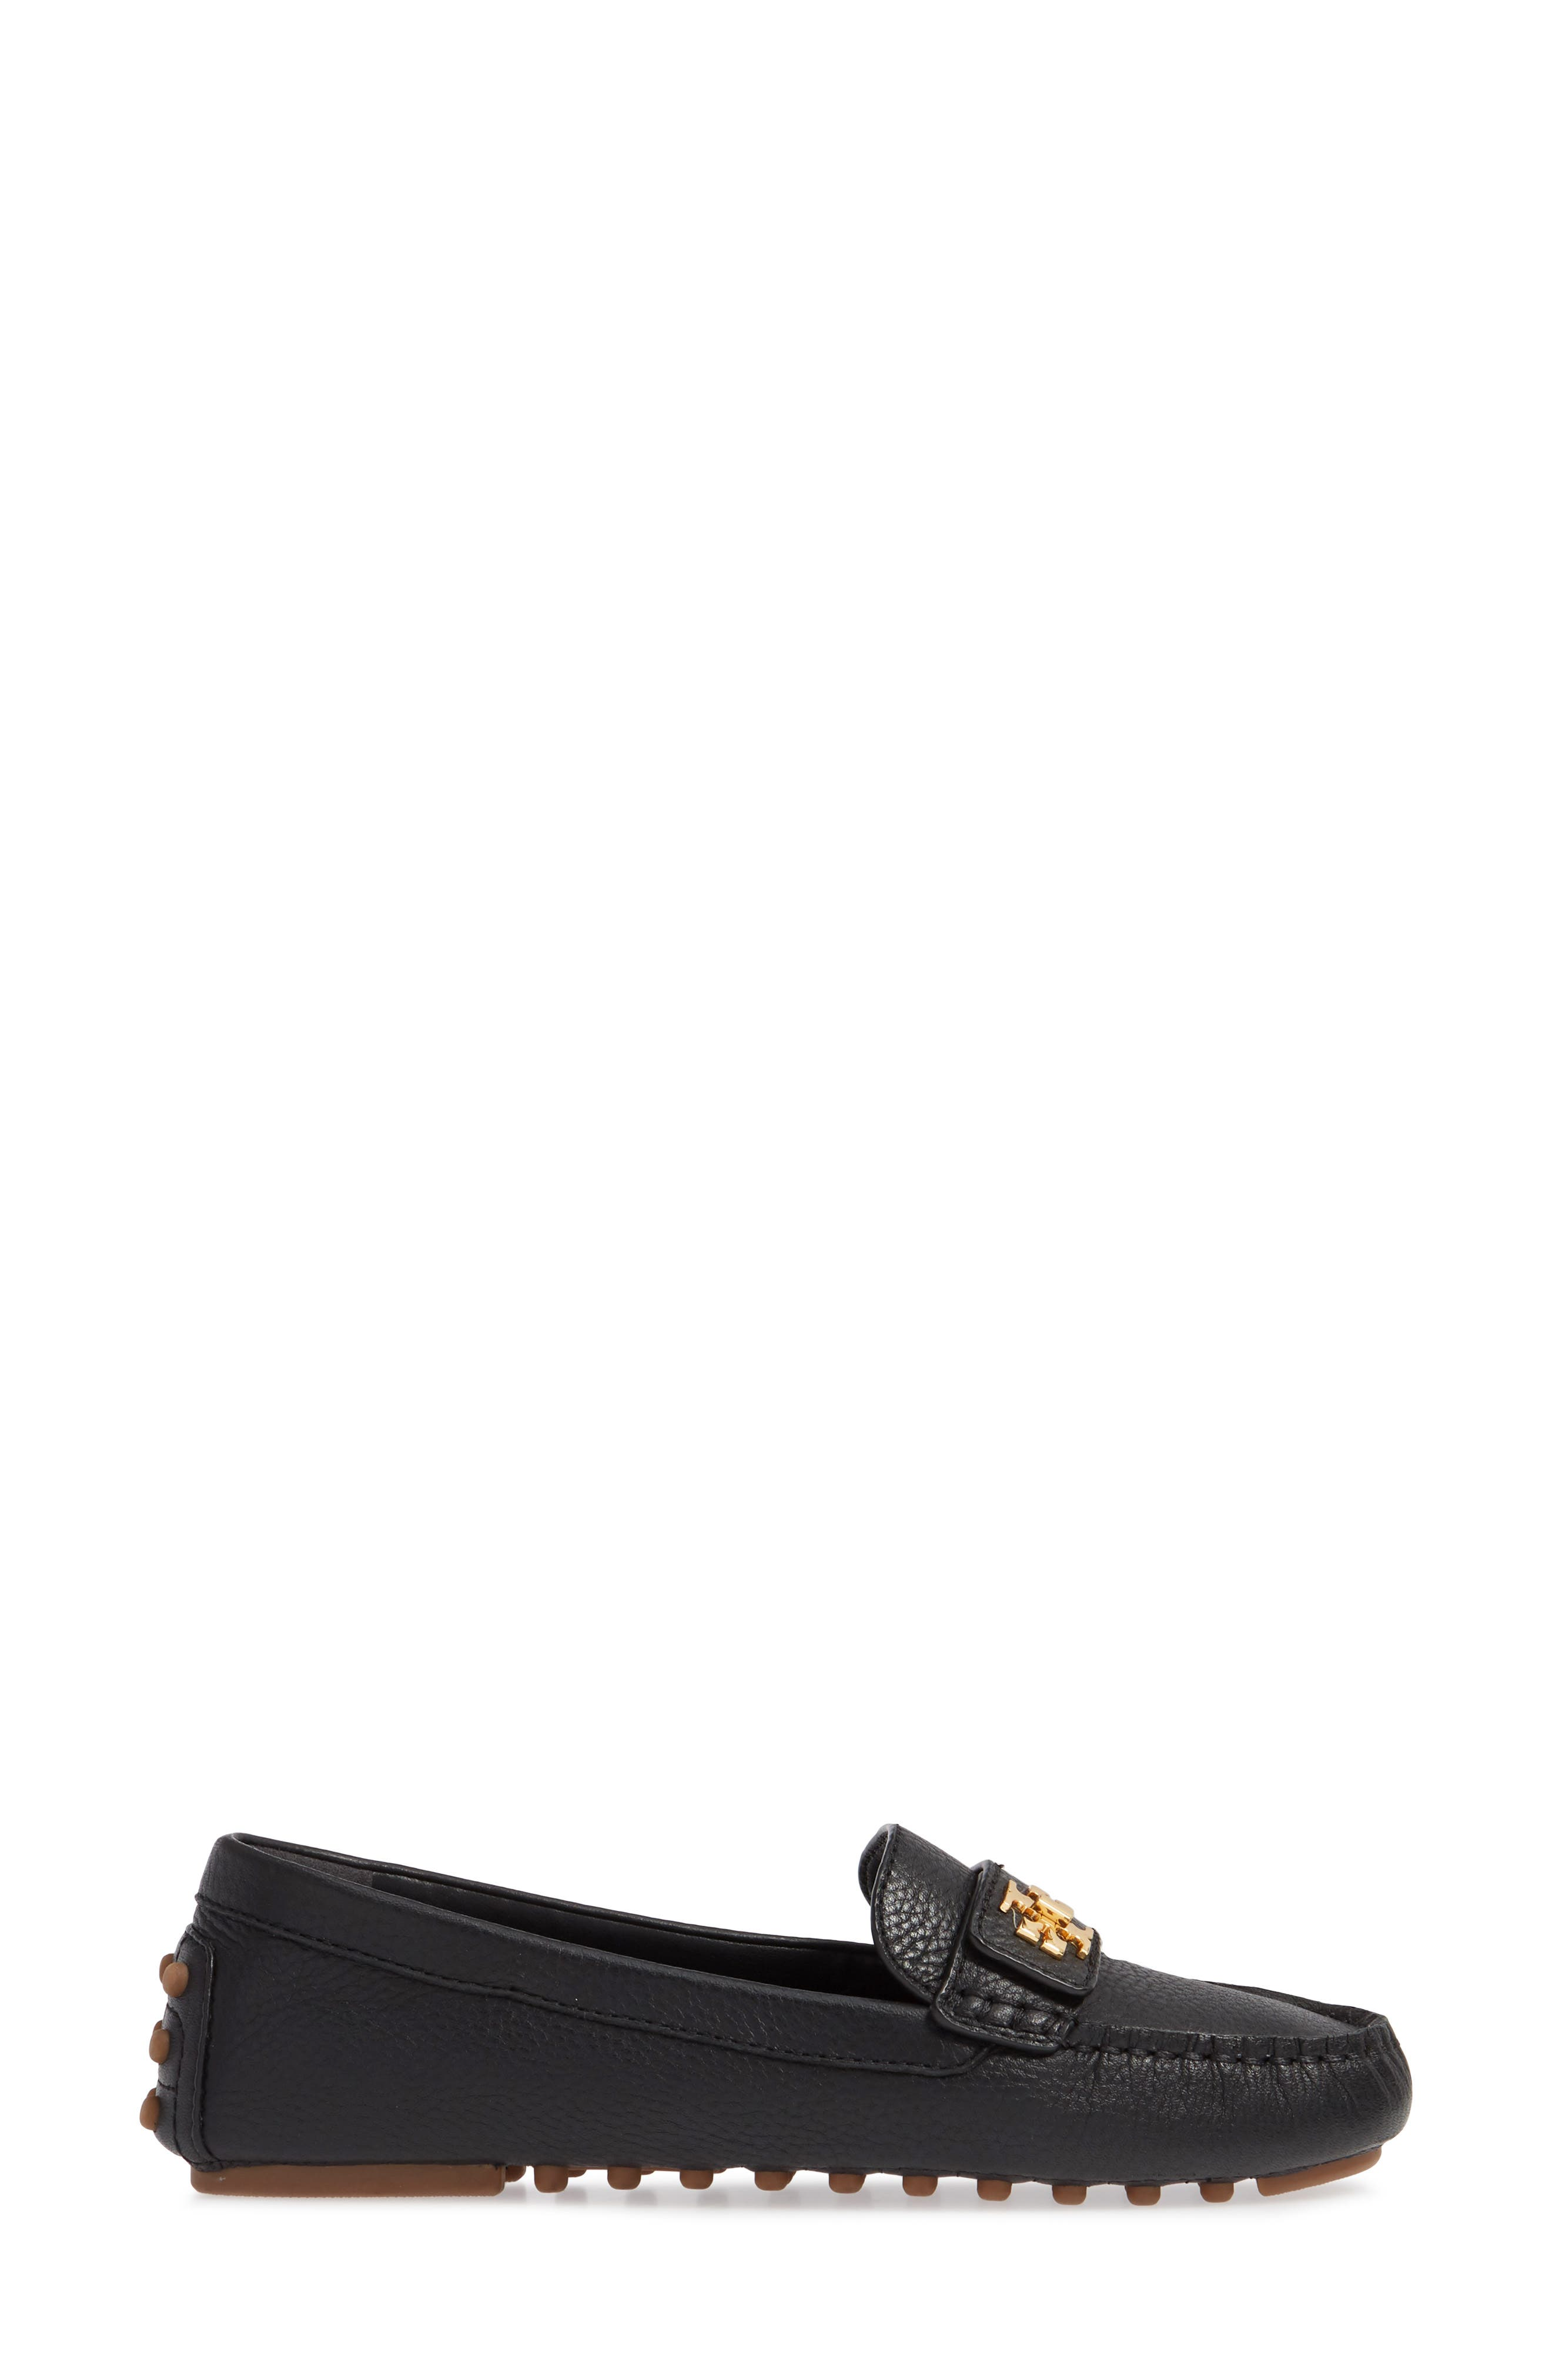 Kira Driving Loafer,                             Alternate thumbnail 3, color,                             PERFECT BLACK